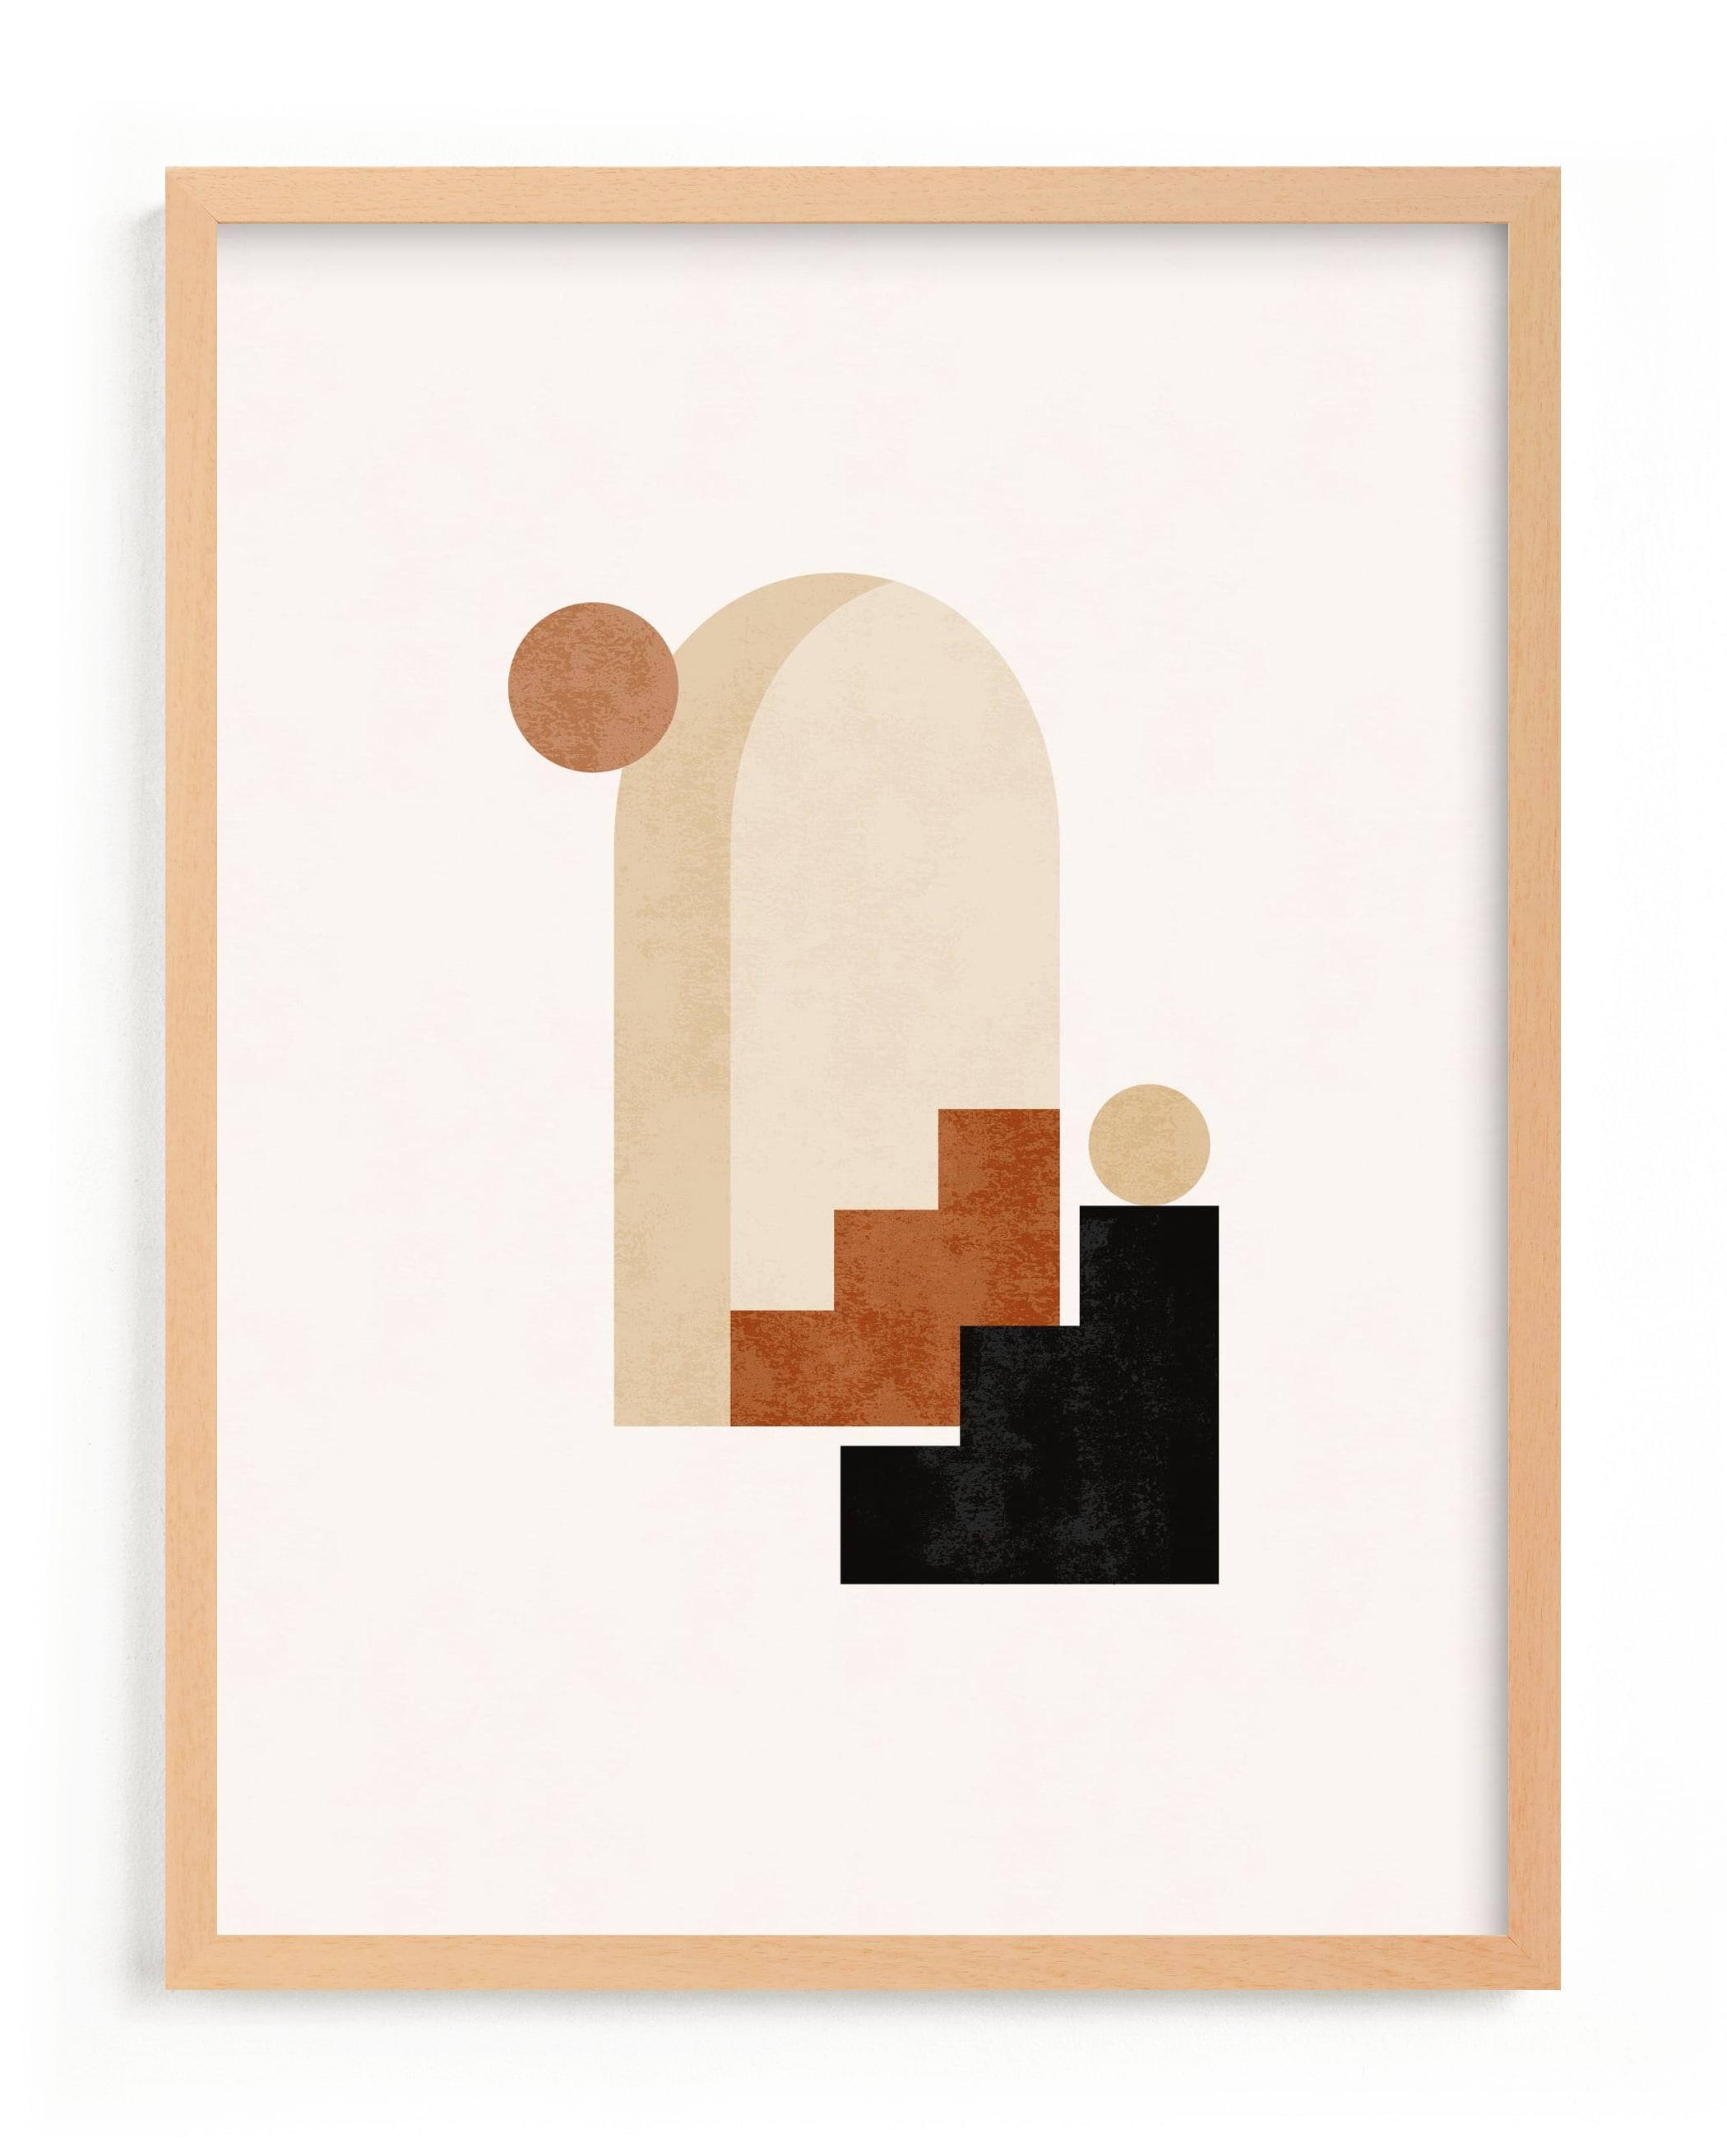 This is a brown art by Iveta Angelova called Rustic Geometry 1.